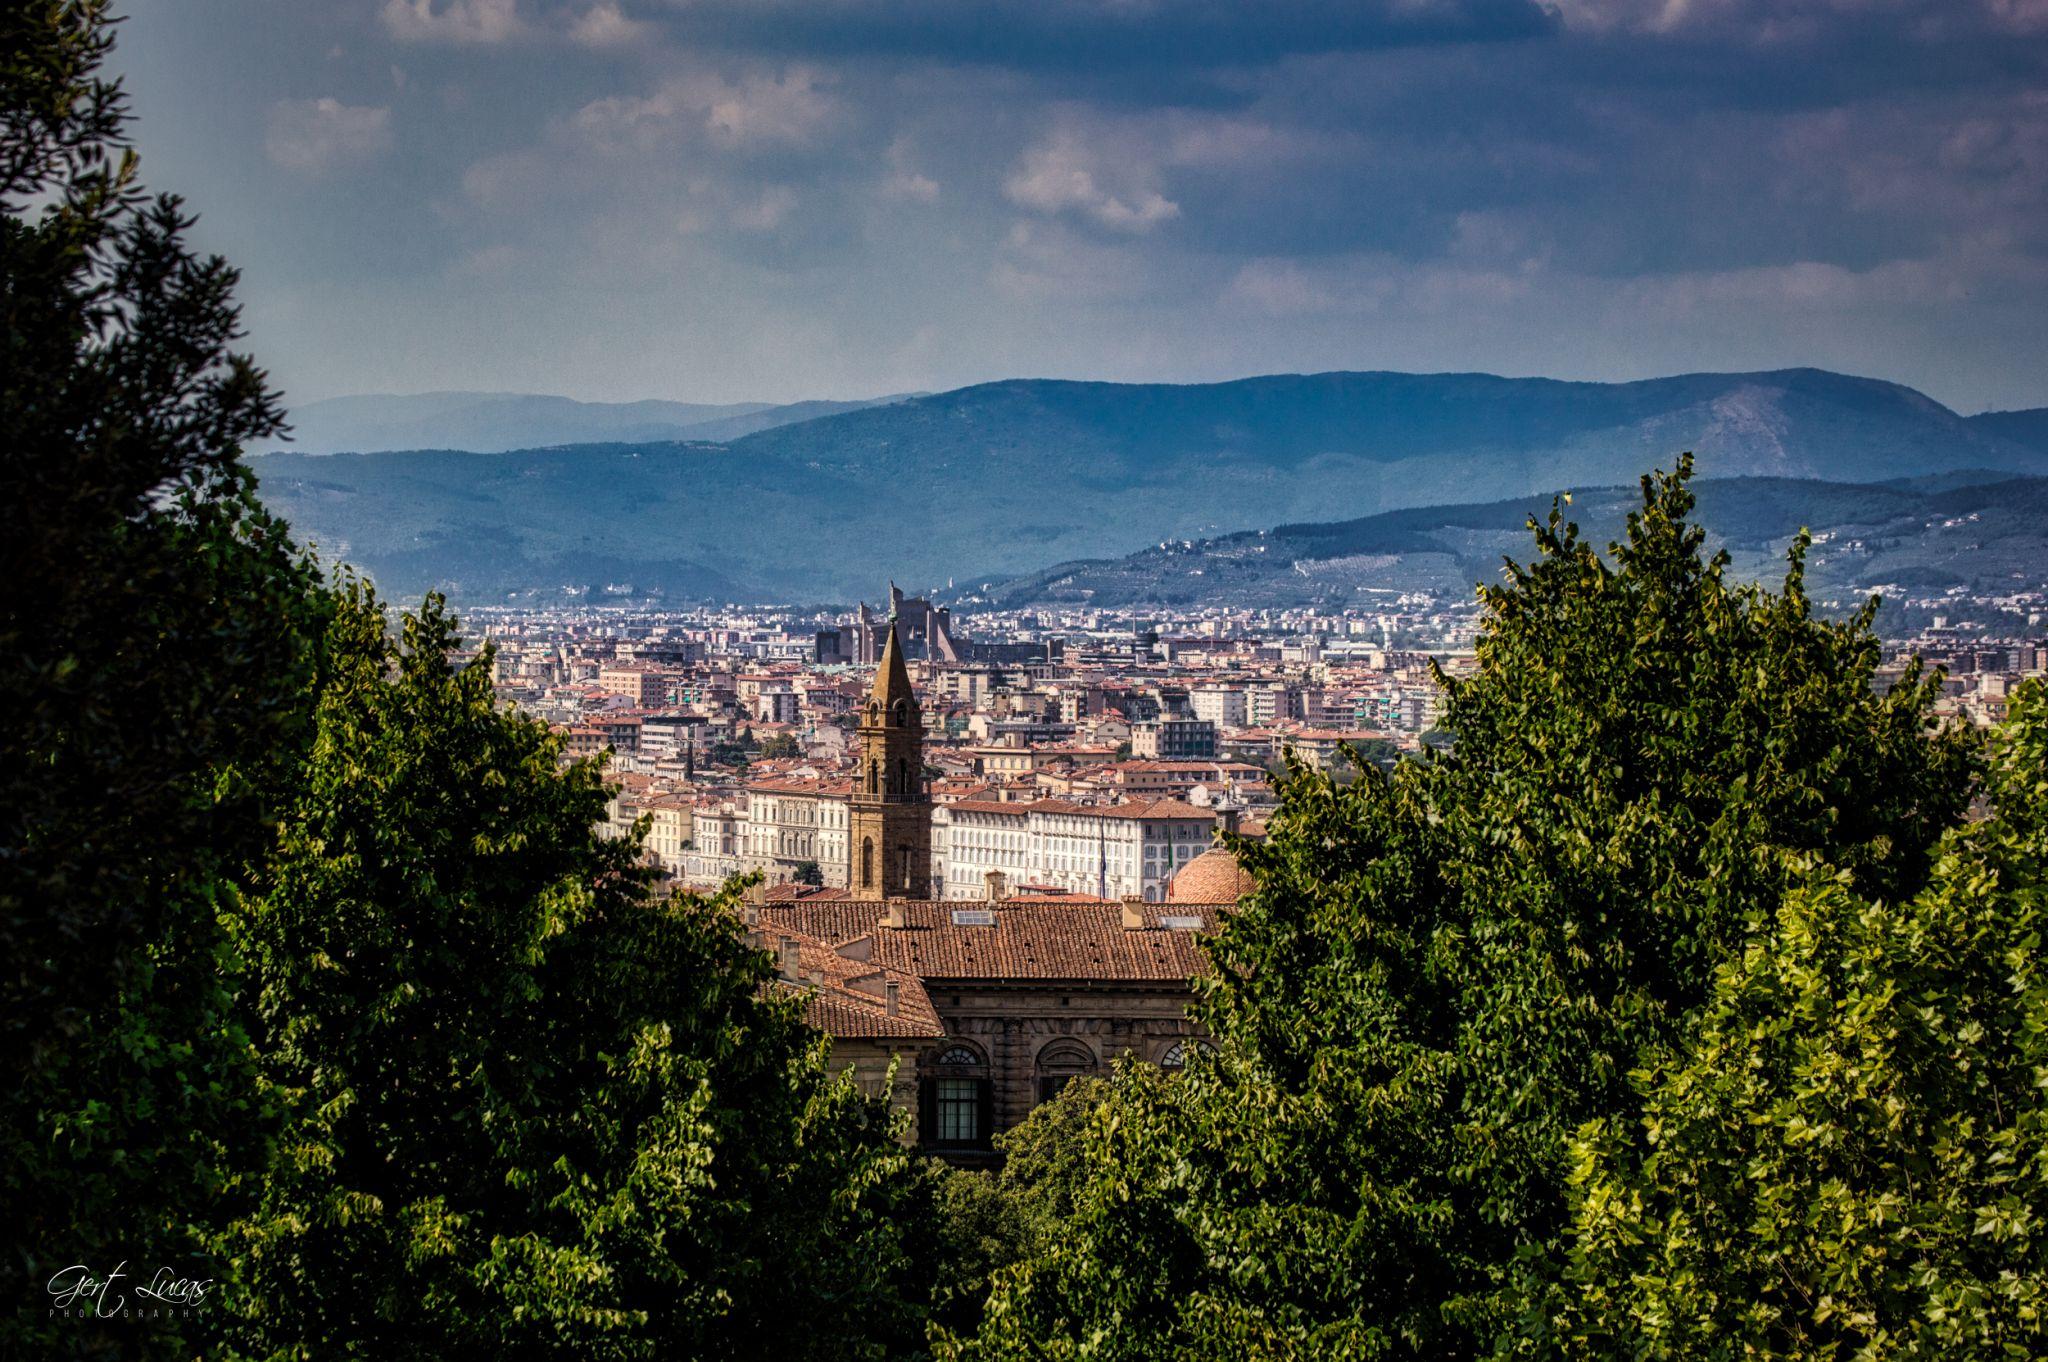 Giardino Di Boboli - Florence Rooftops, Italy